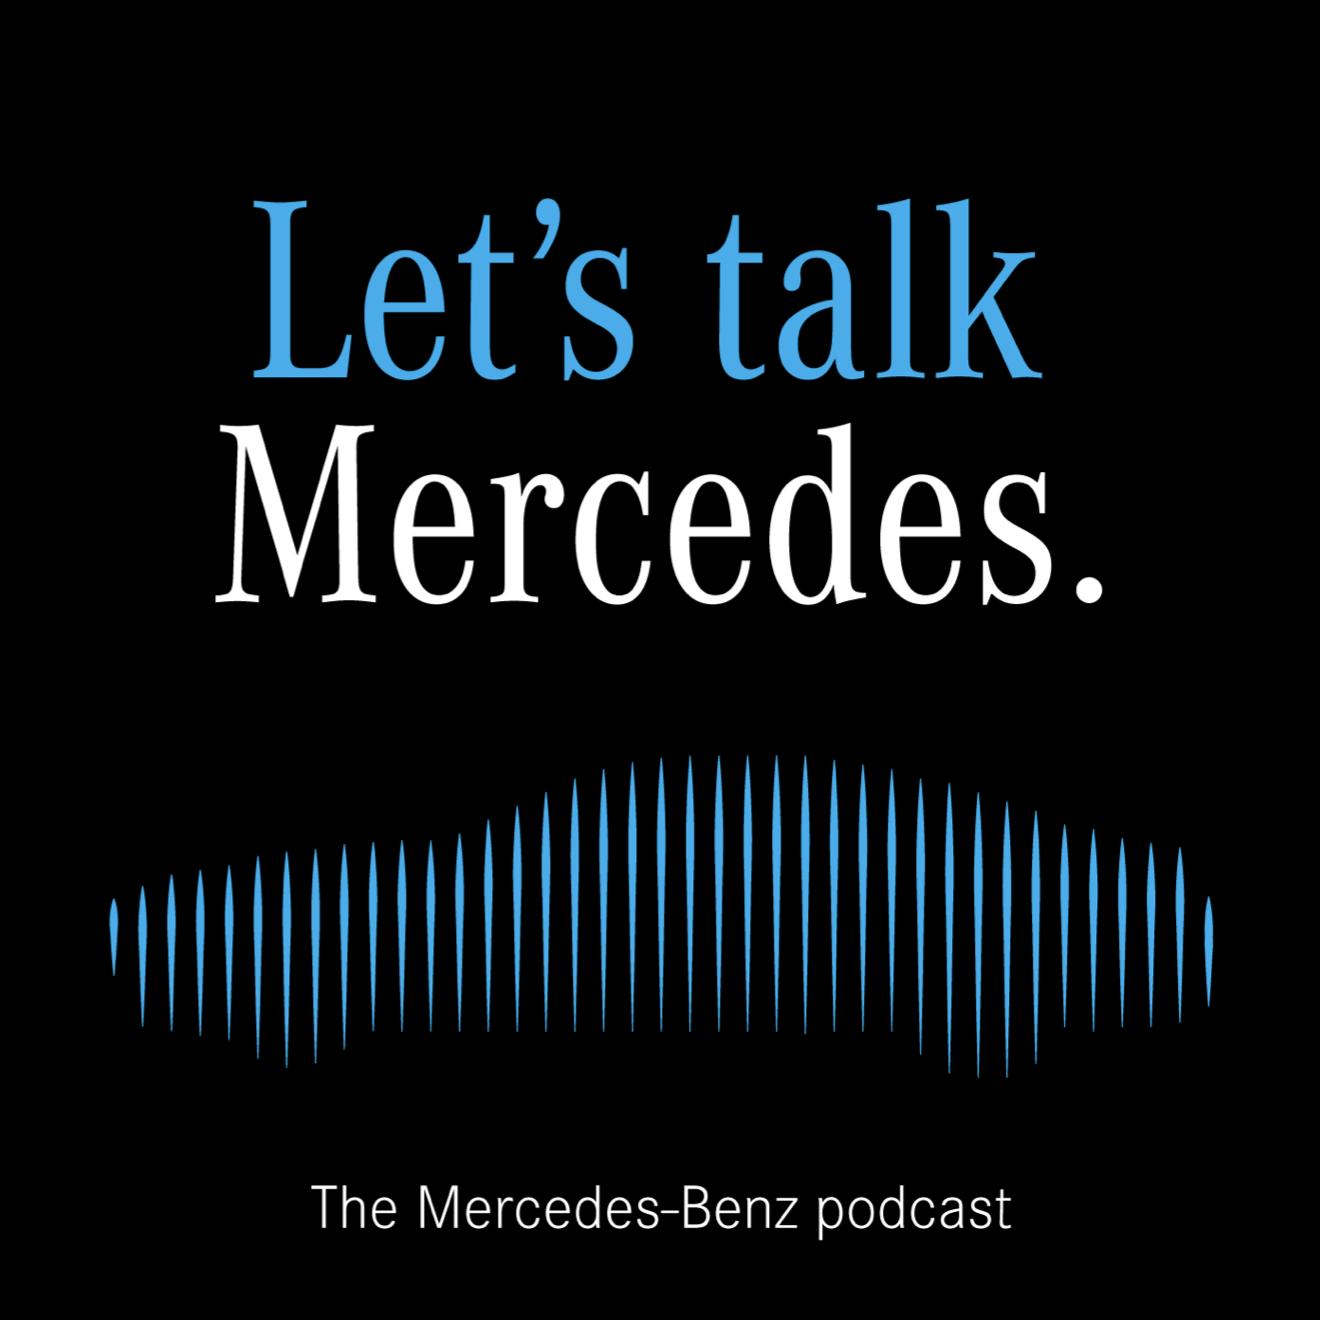 Let's talk Mercedes